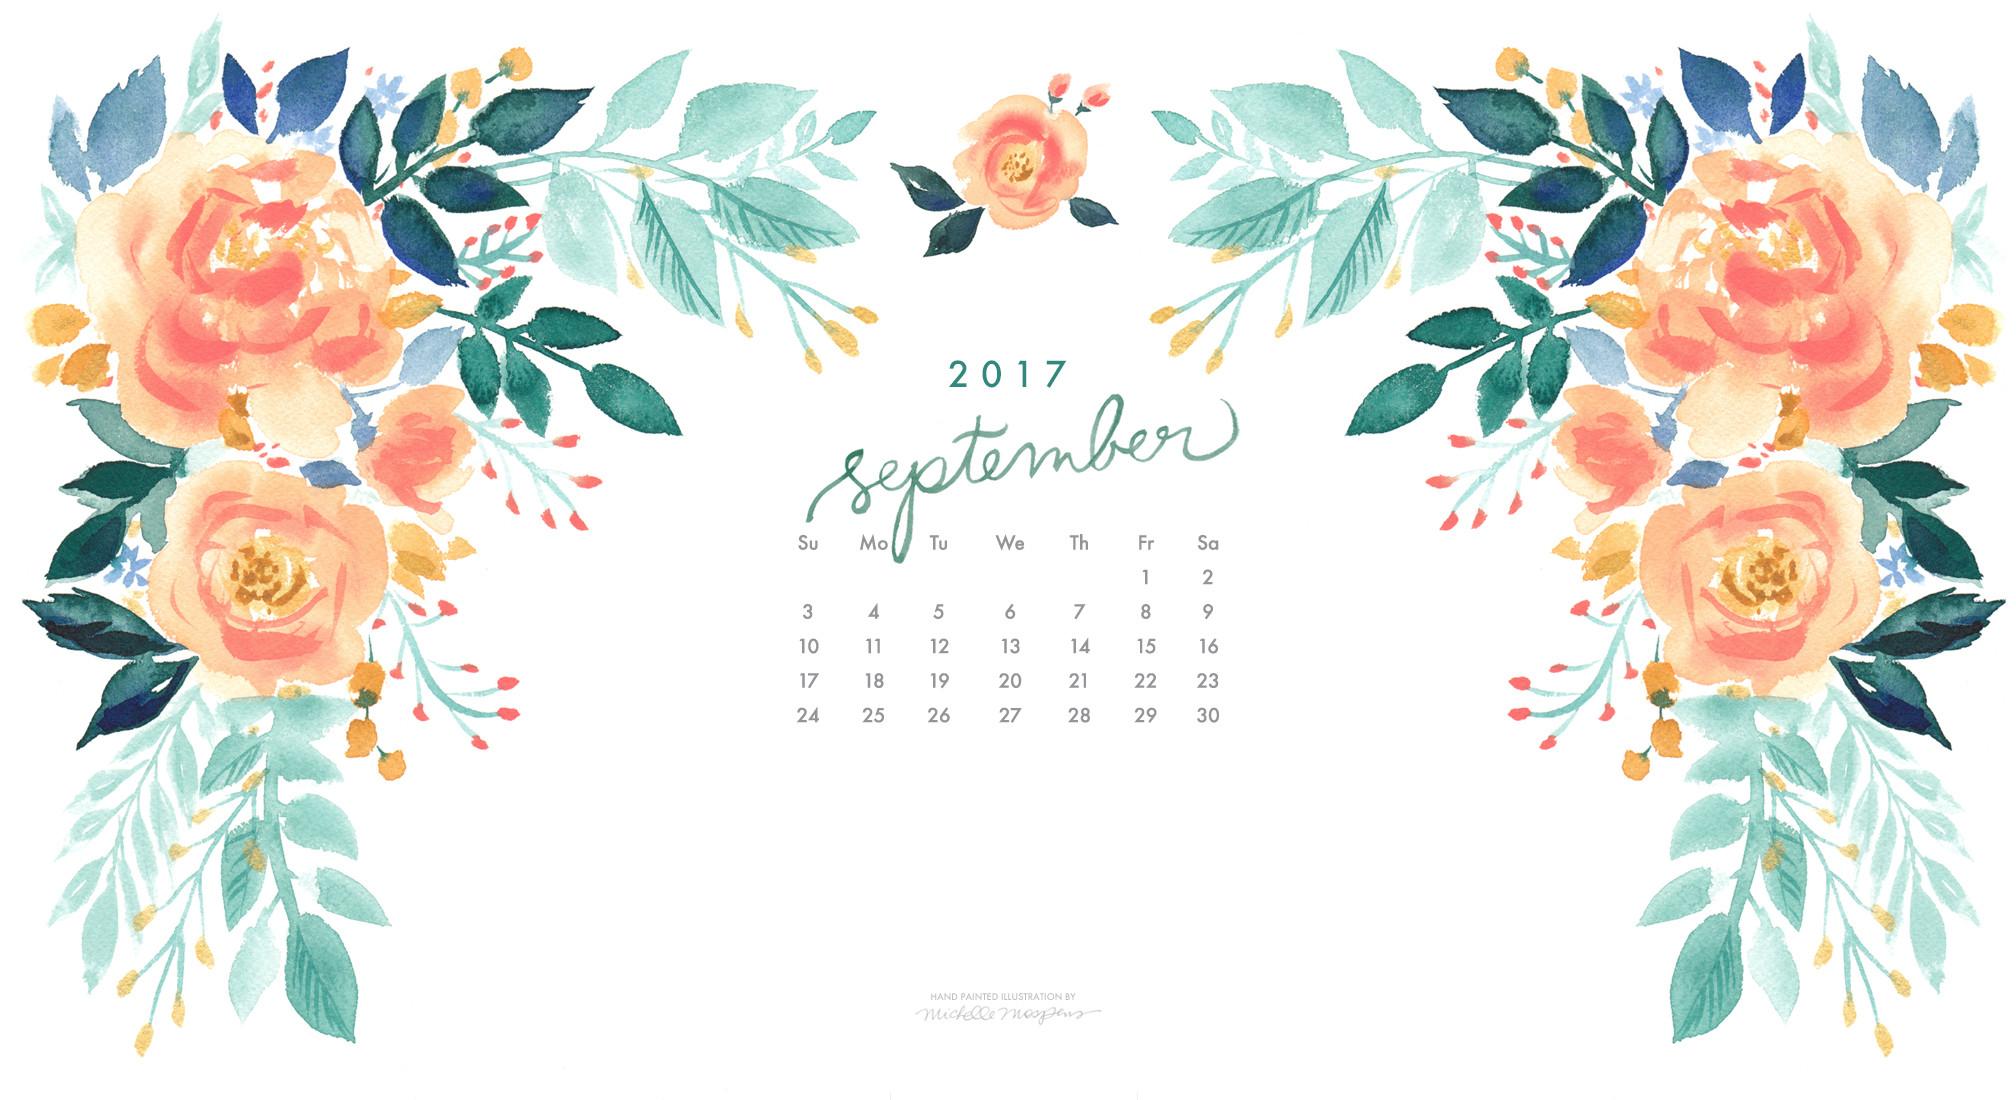 Watercolor Desktop Wallpaper Calendar : Watercolor wallpapers for desktop images